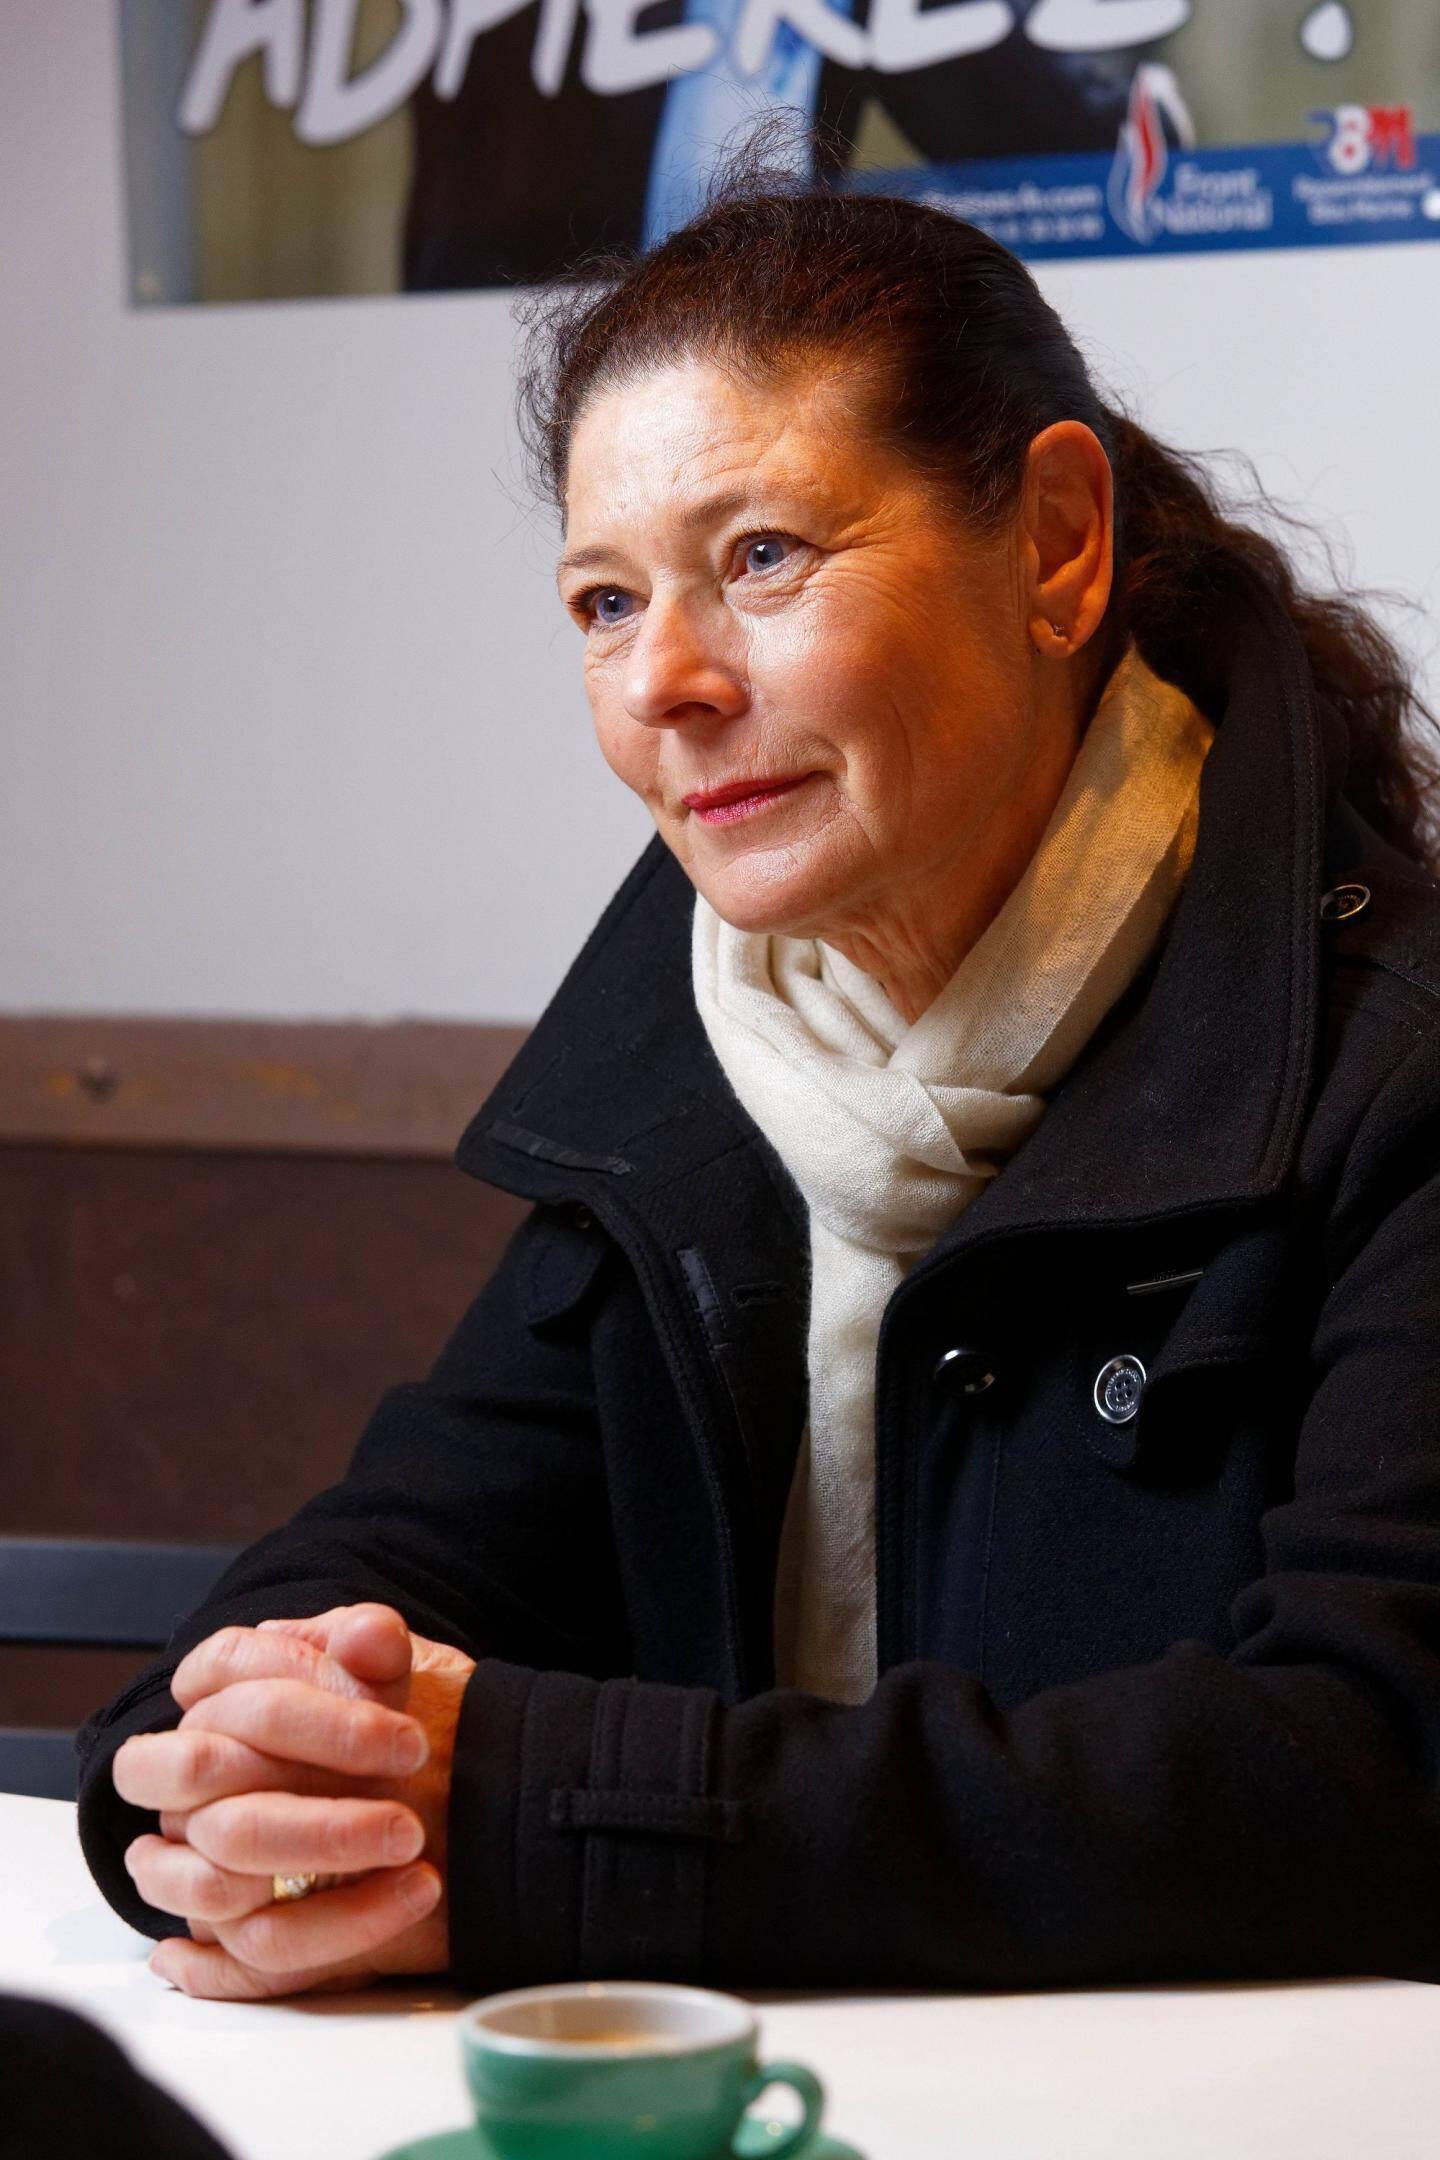 La conseillère régional RN Muriel Fiol